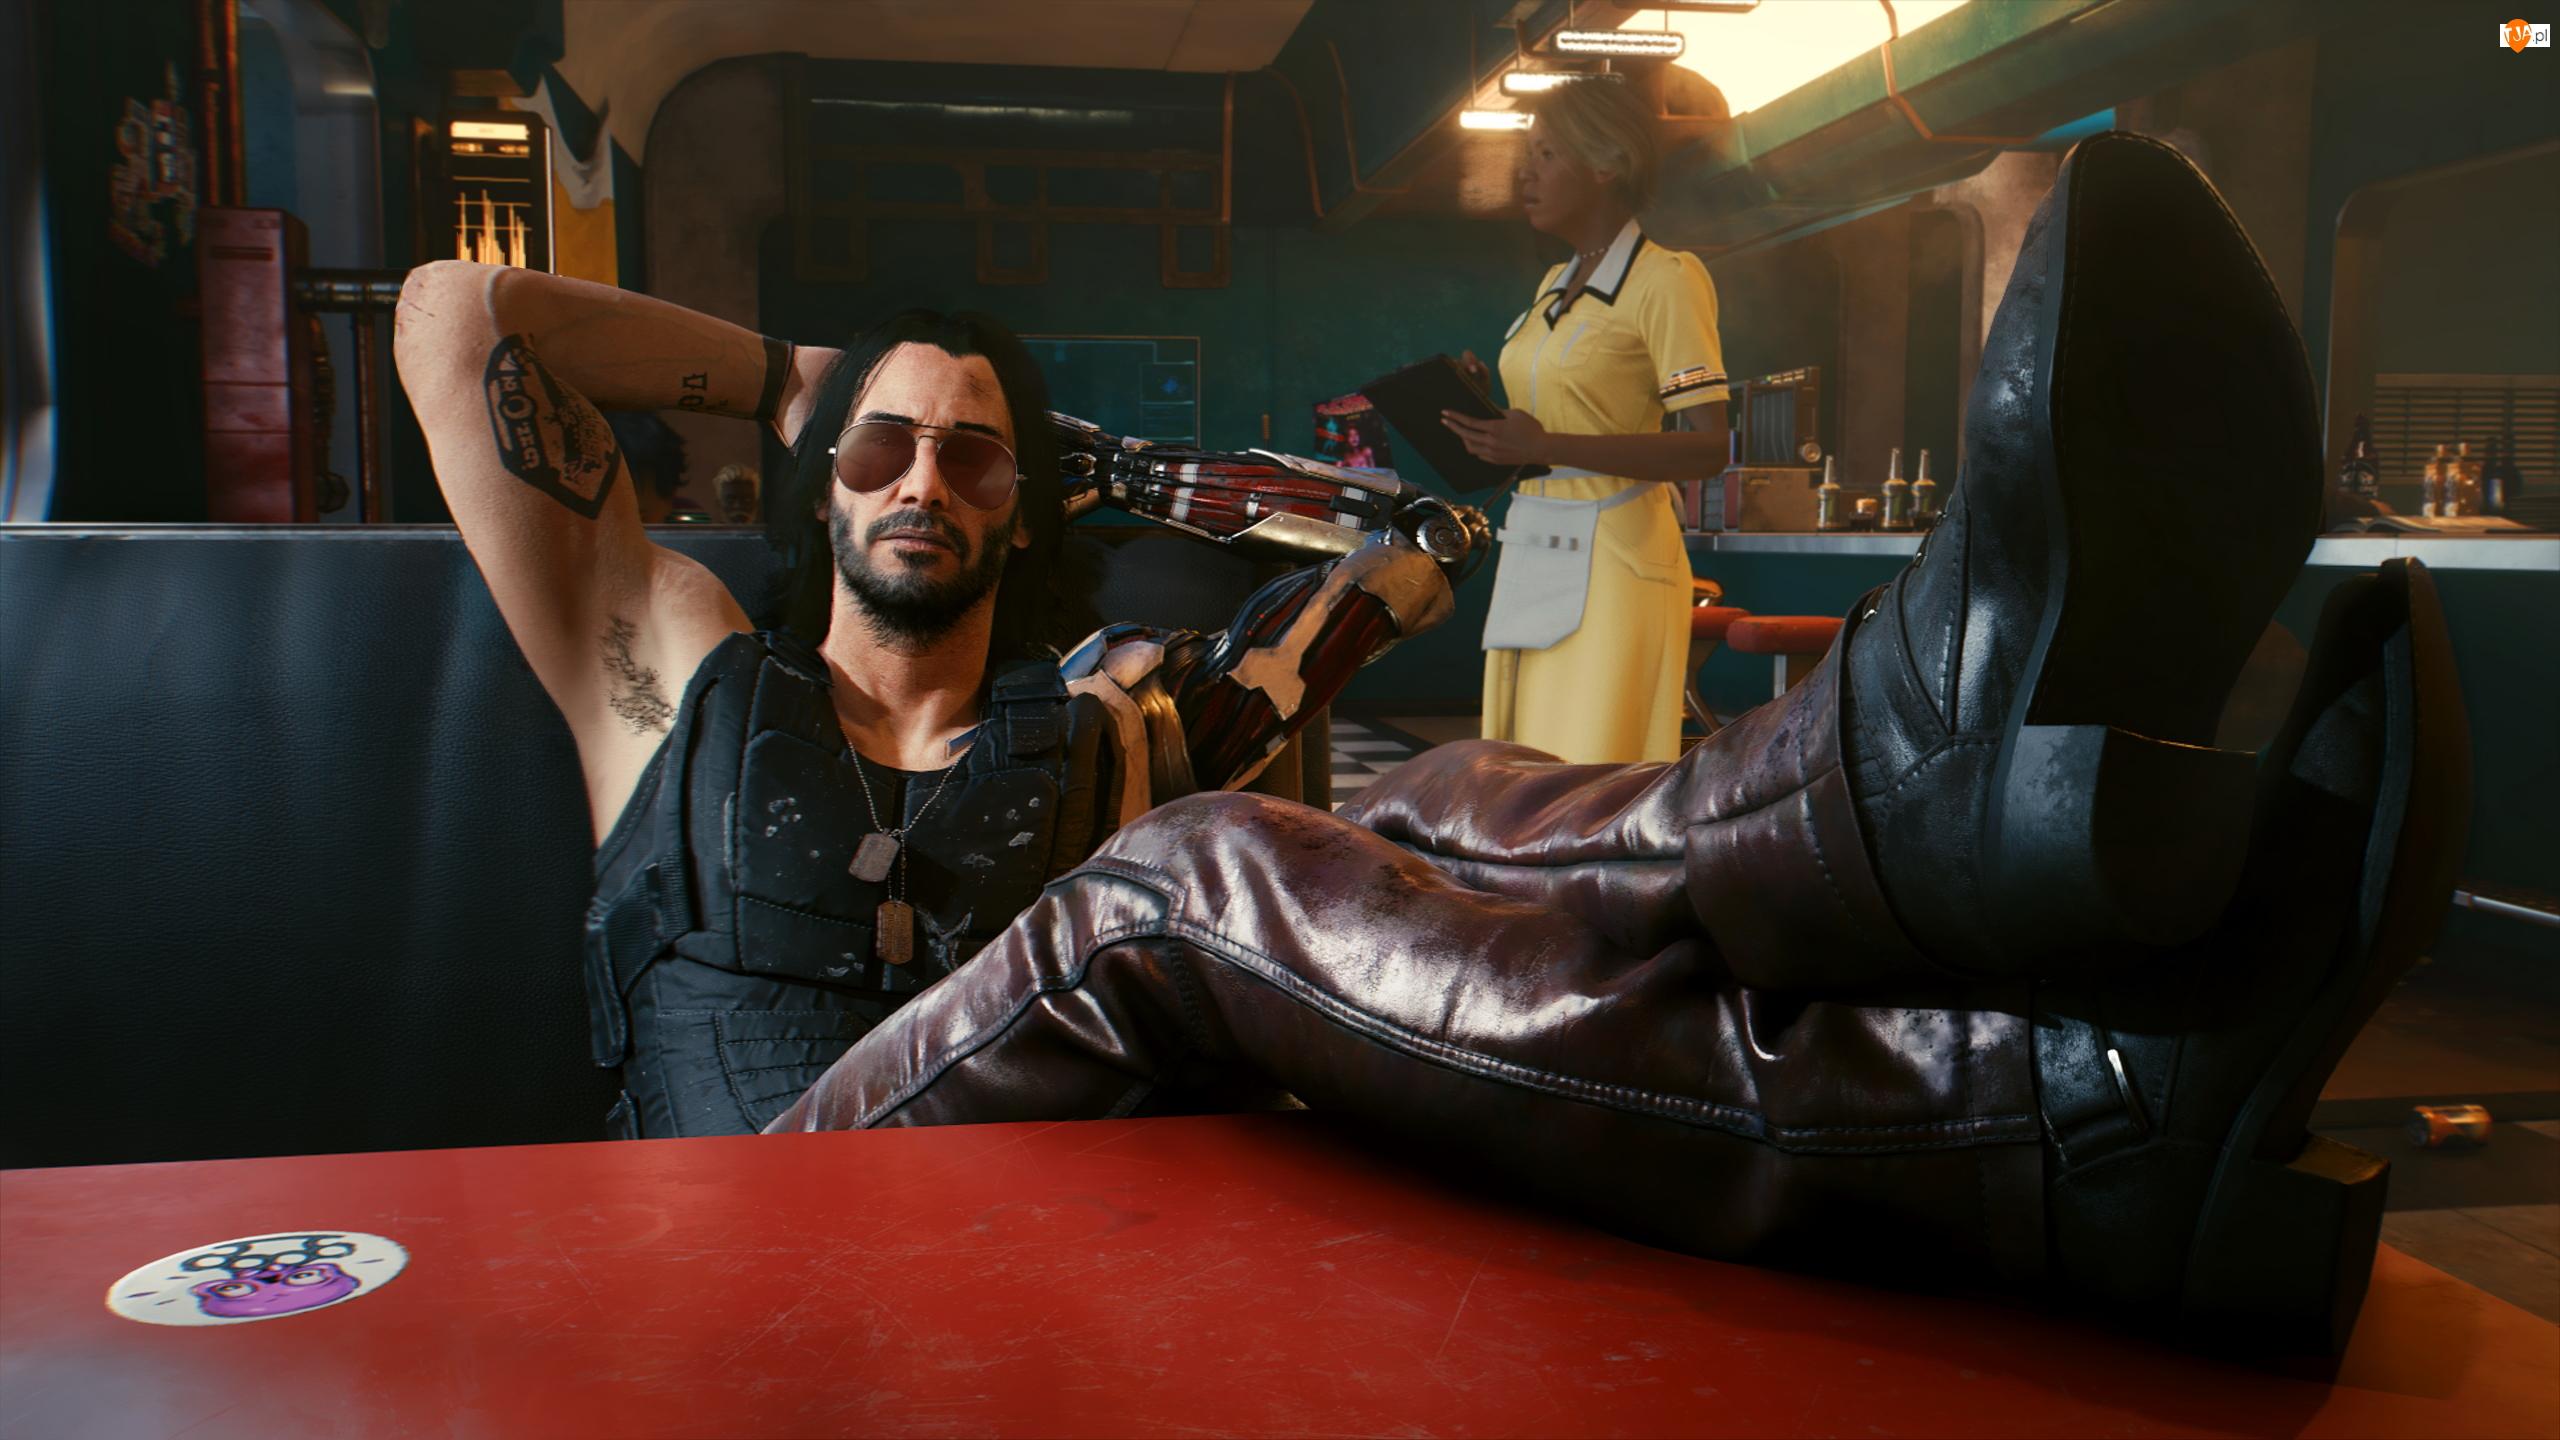 Cyberpunk 2077, Gra, Johnny Silverhand, Keanu Reeves, Postać, Aktor